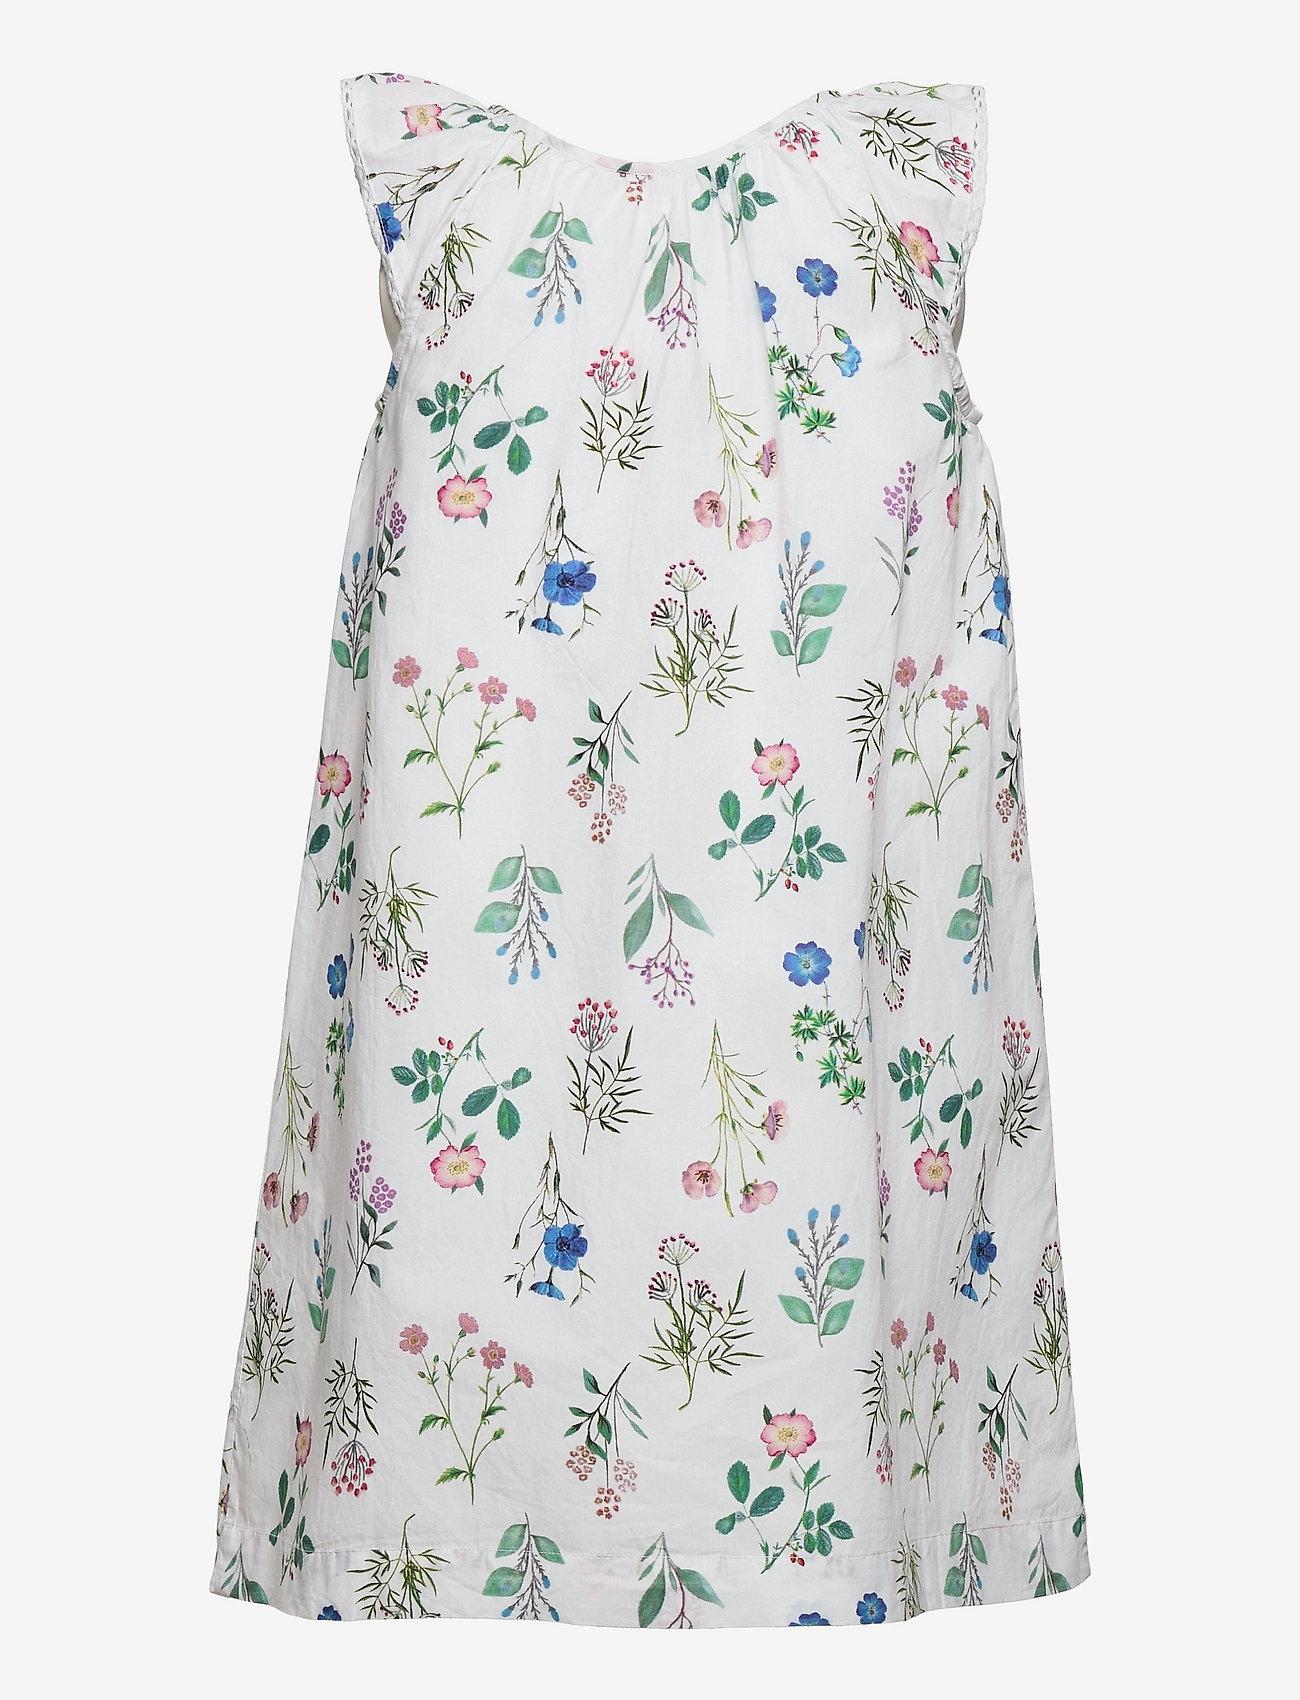 Noa Noa Miniature - Dress sleeveless - kjoler & nederdele - print multicolour - 1